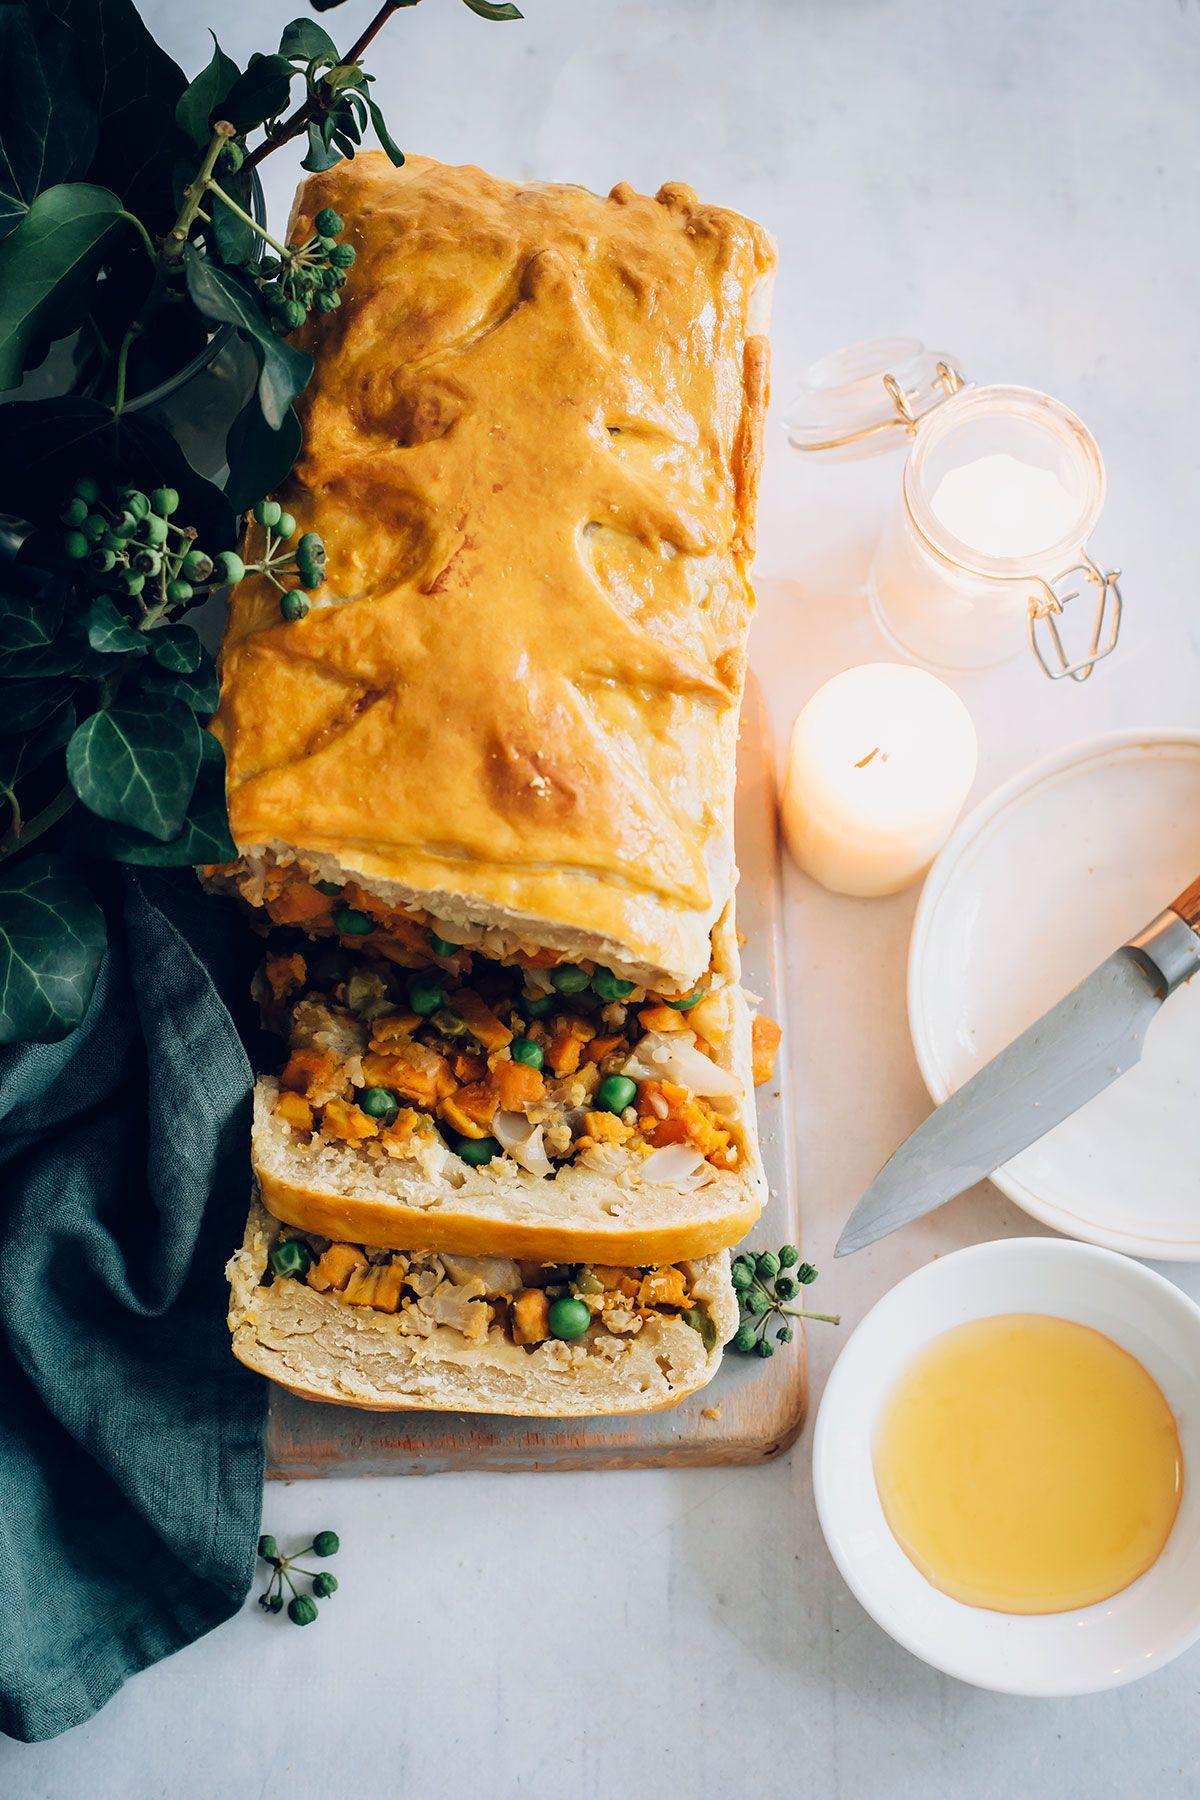 Festive Sweet Potato Samosa Pie Hello Veggie Recipe Vegan Chicken Pot Pie Vegetarian Dishes Mint Recipes